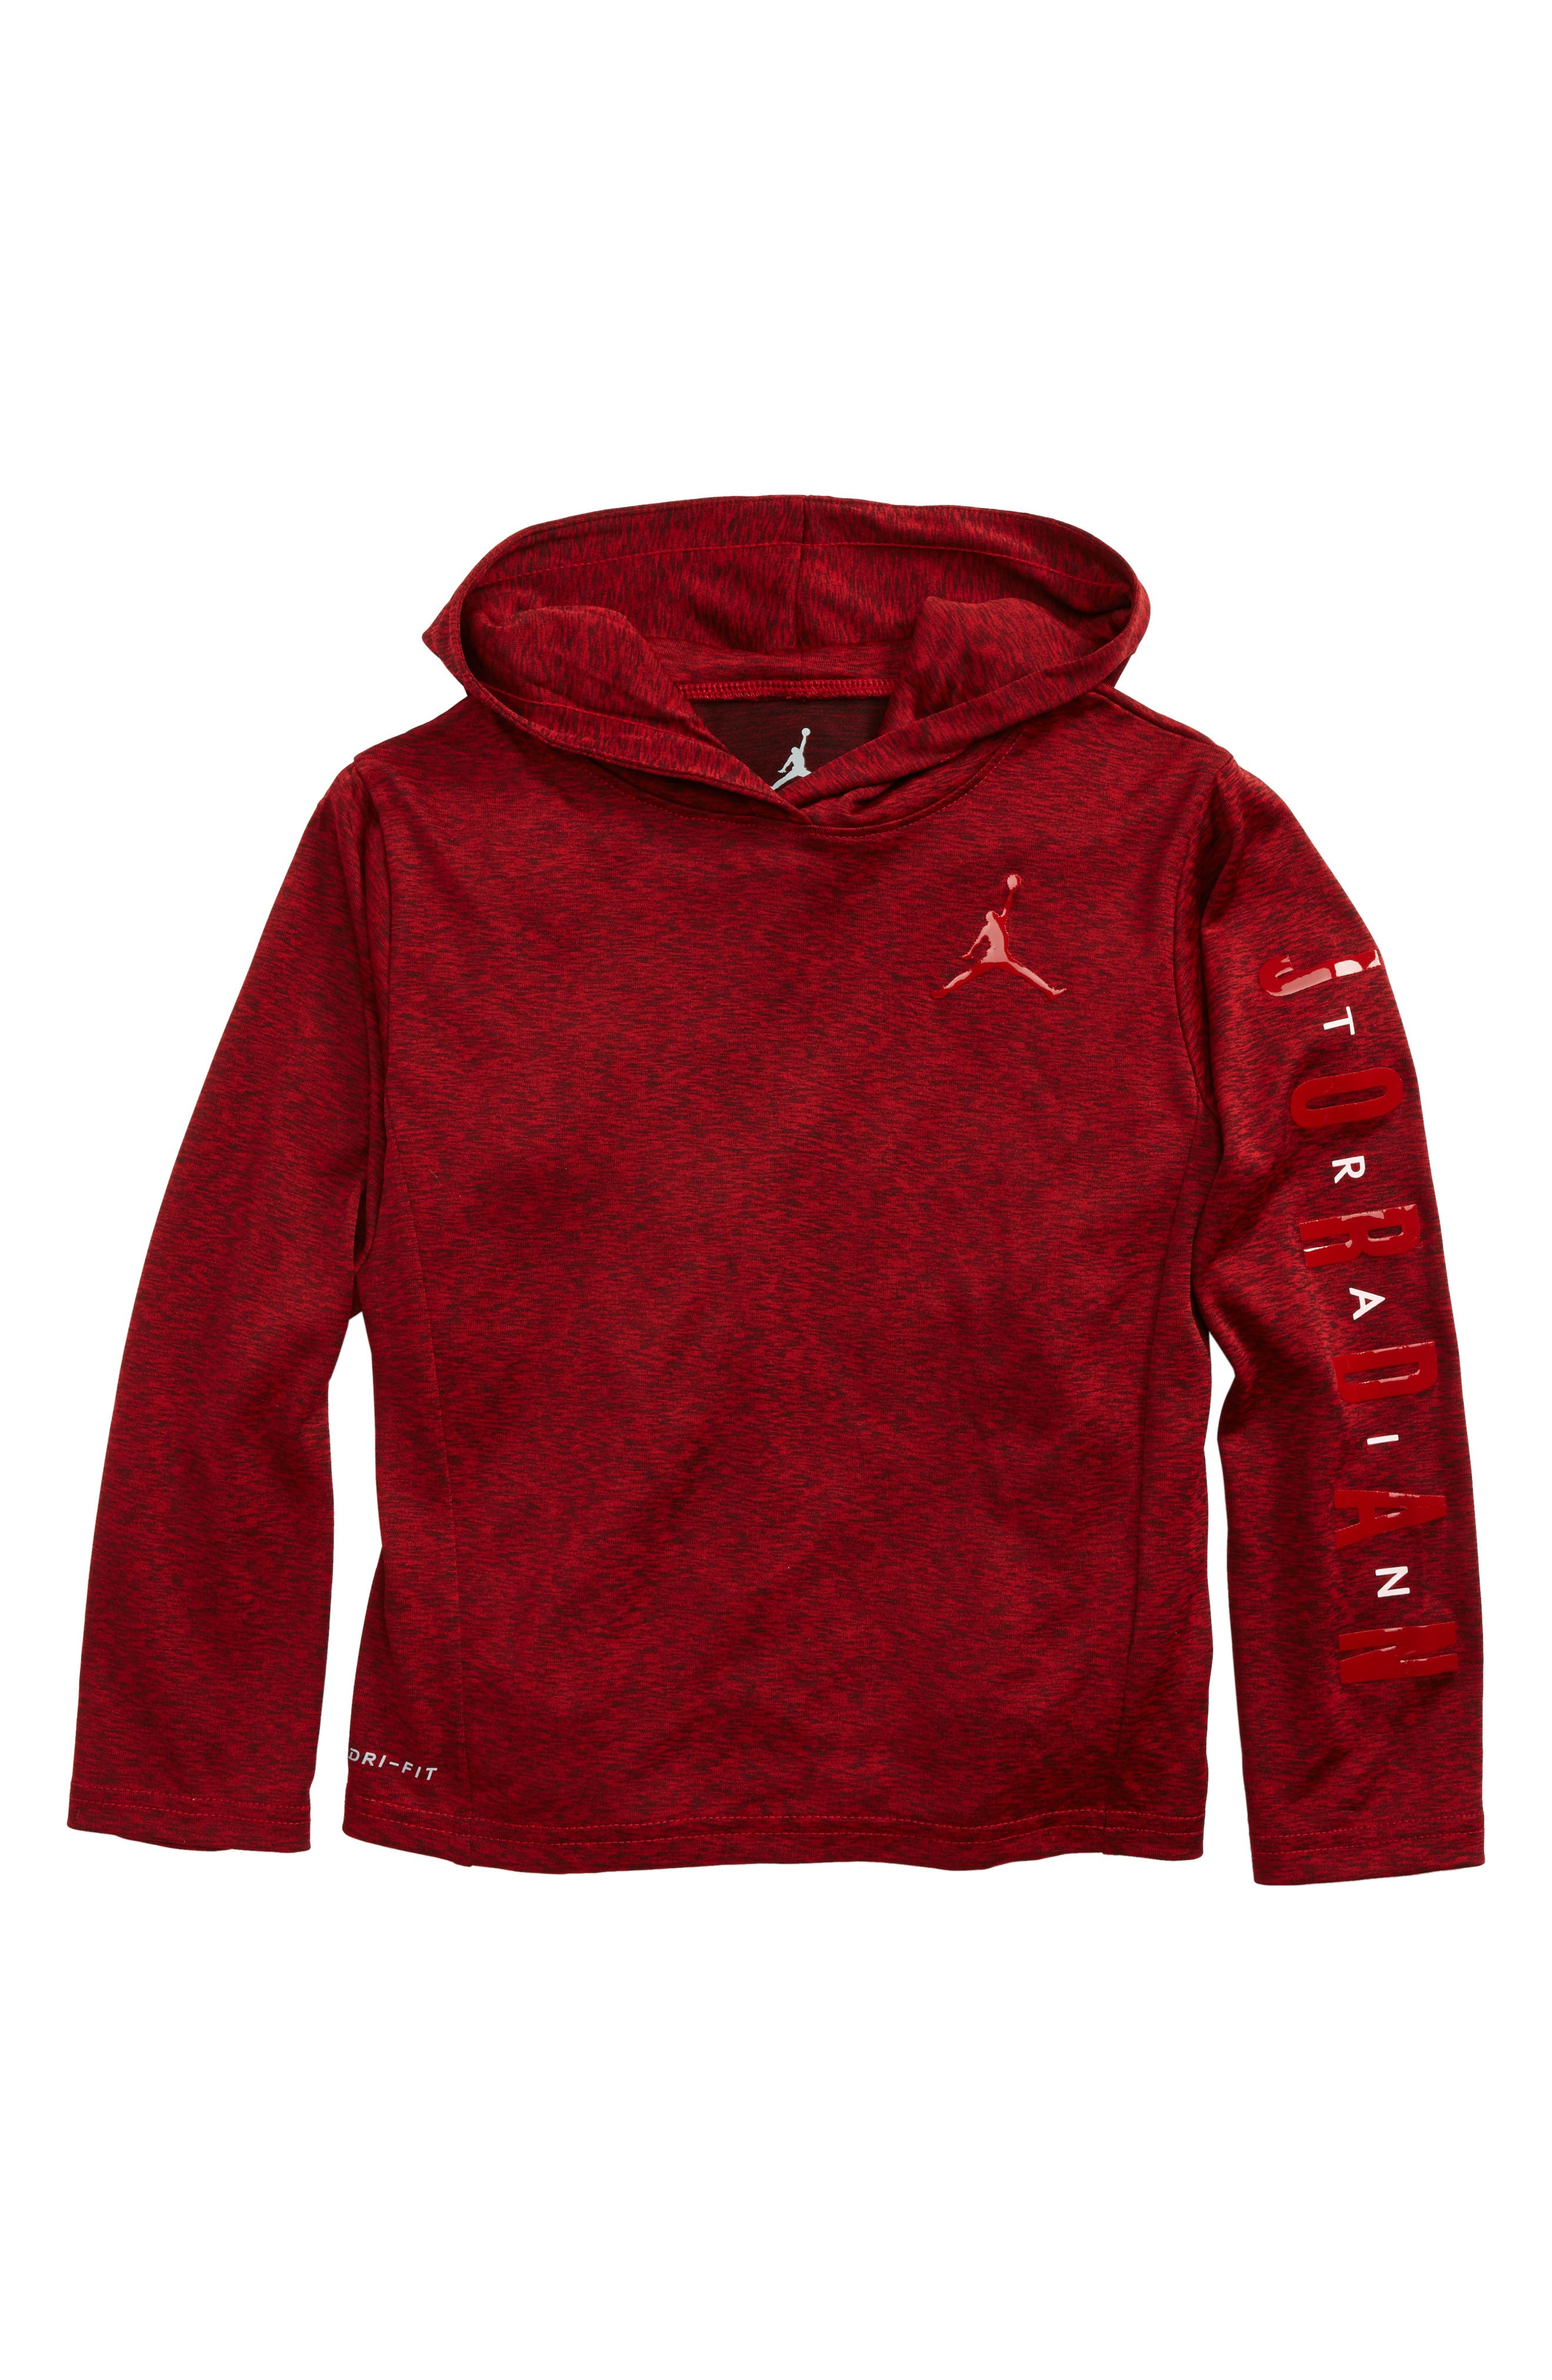 Jordan Dri-FIT Hooded T-Shirt,                         Main,                         color, 606